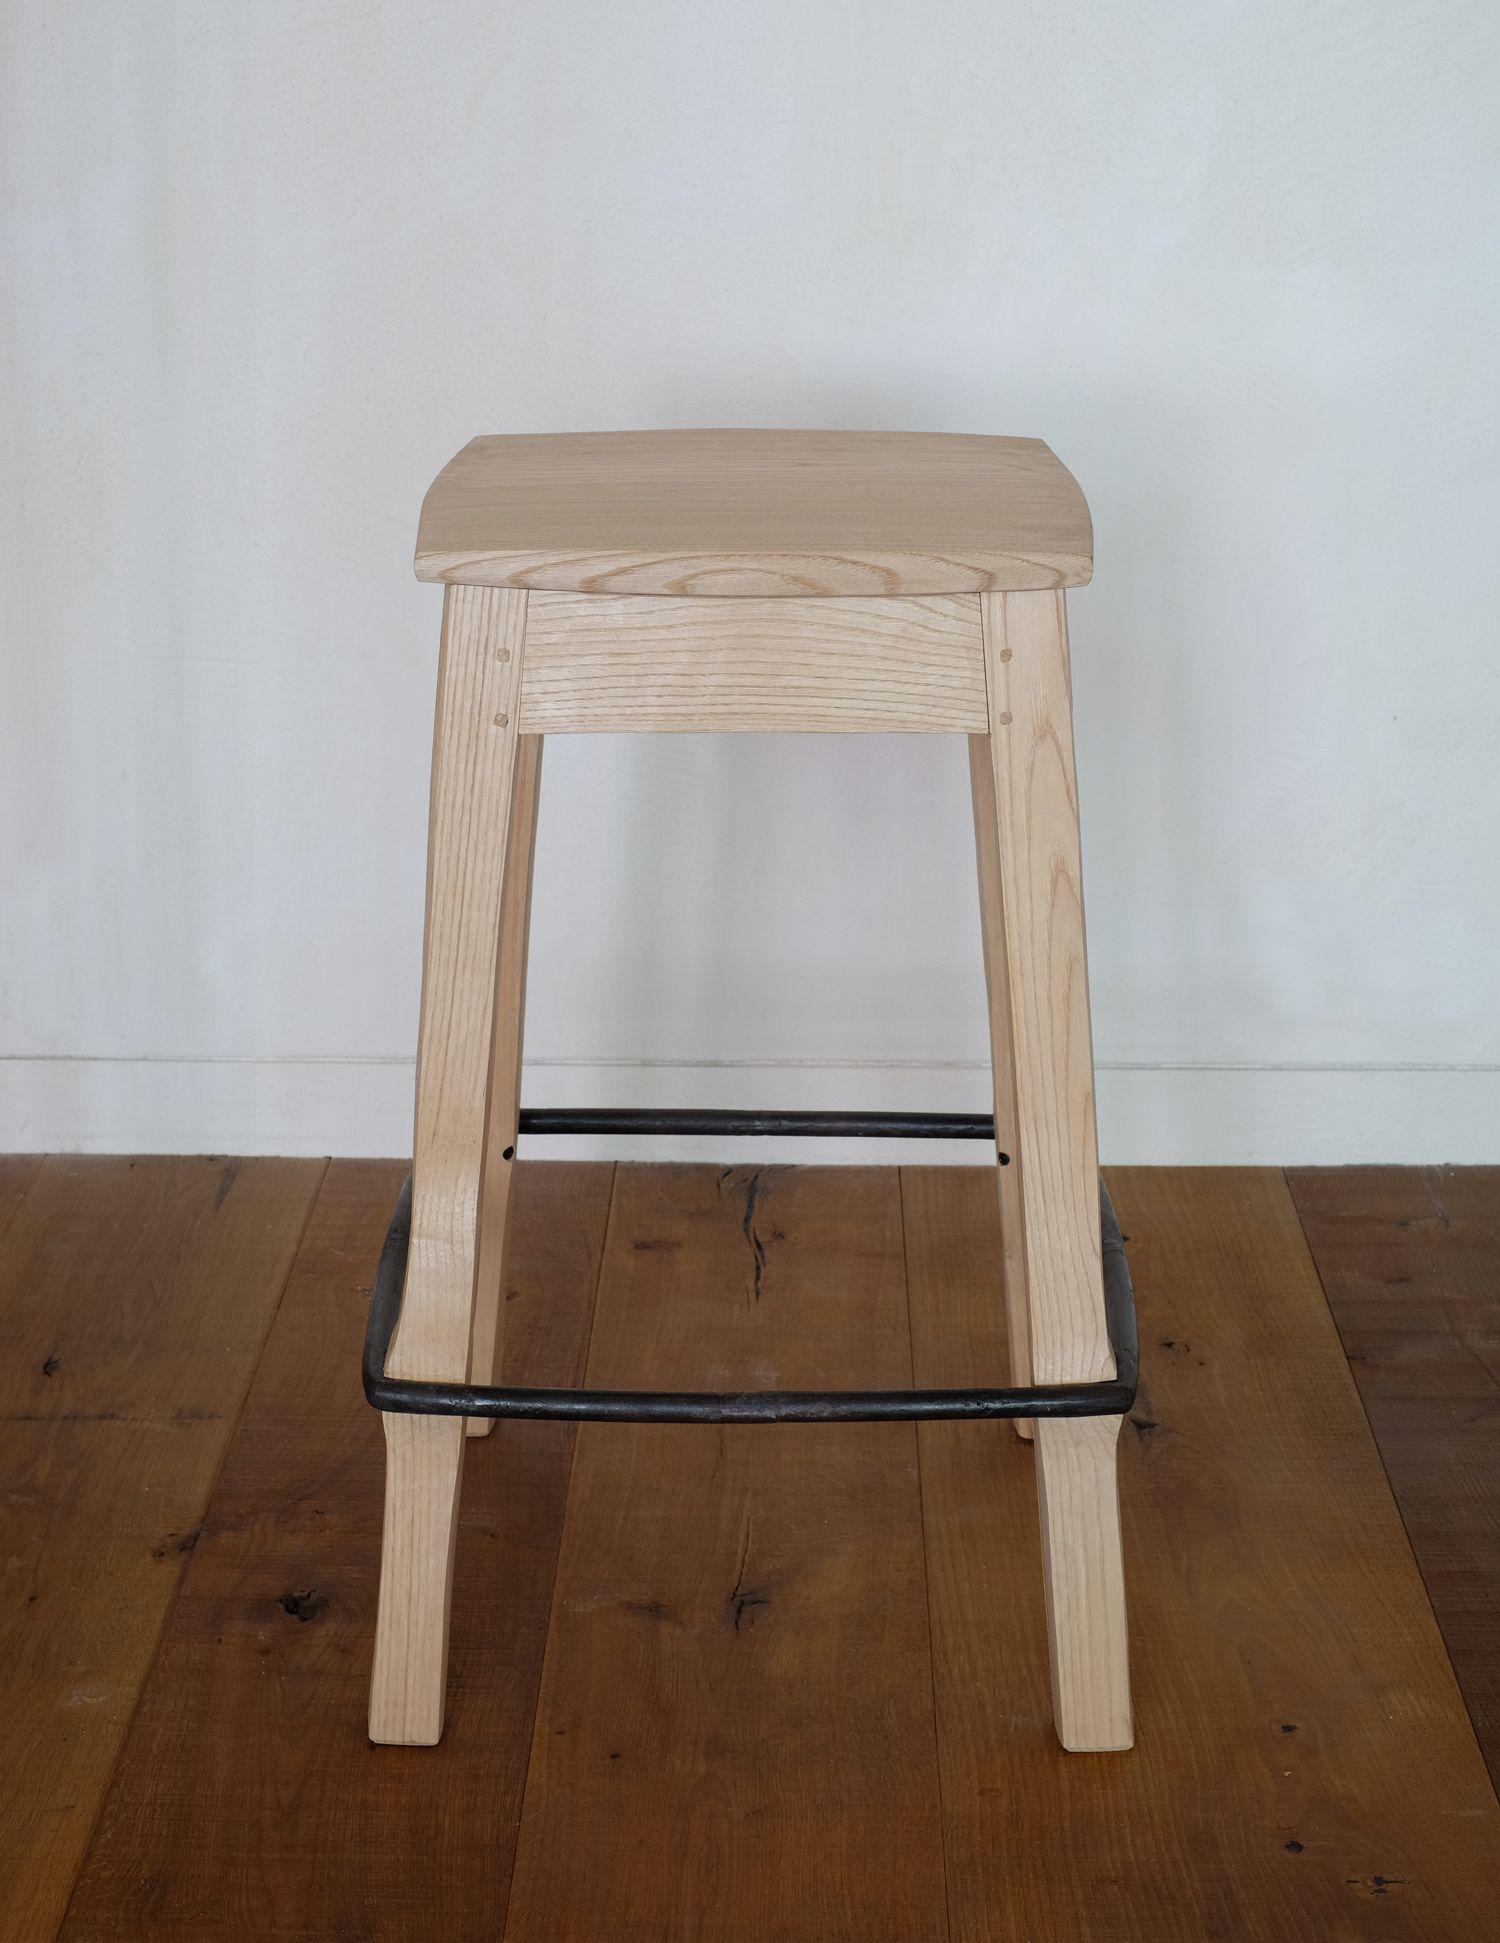 5b040dba622490c70e3a24dc84ee5e58 Unique De Table Basse Fer forge Concept